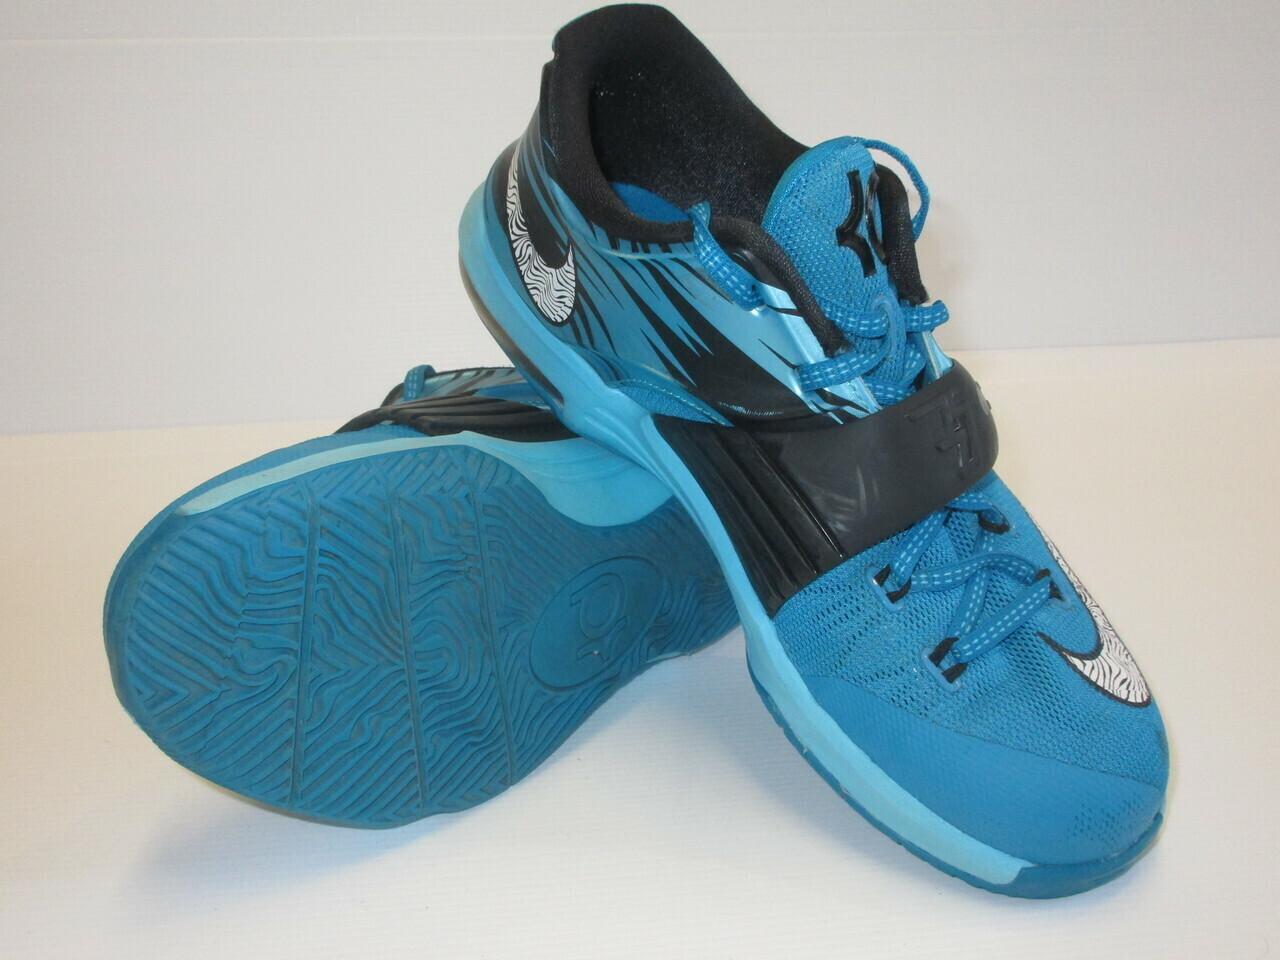 Nike Running Shoes US5 (Near-New) (EC255)